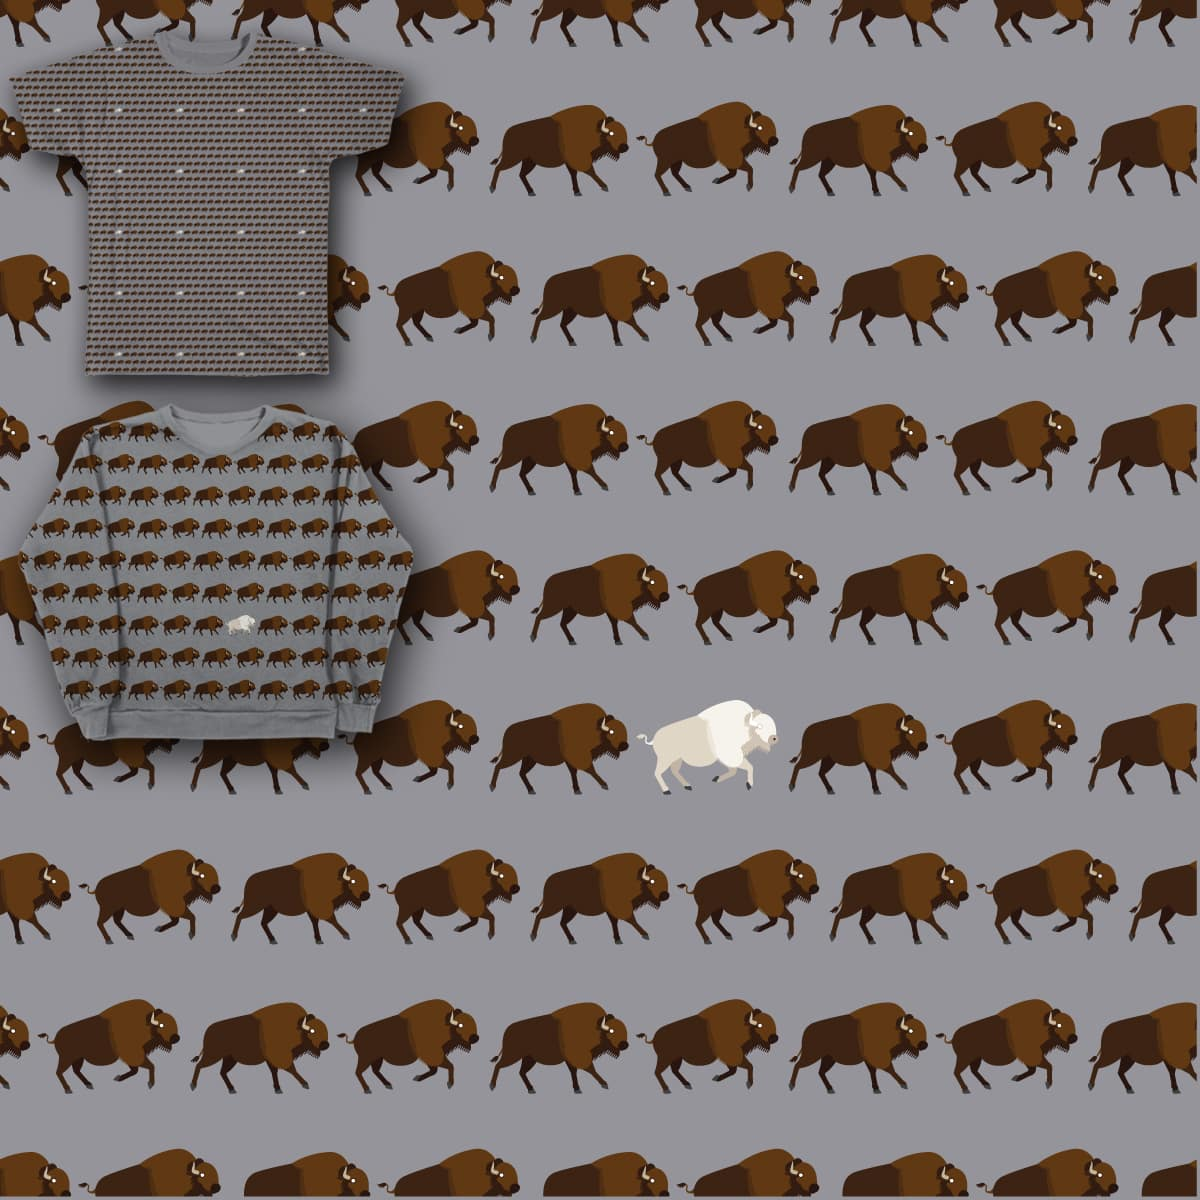 Tatanka Ska by Rubbishdesigner on Threadless